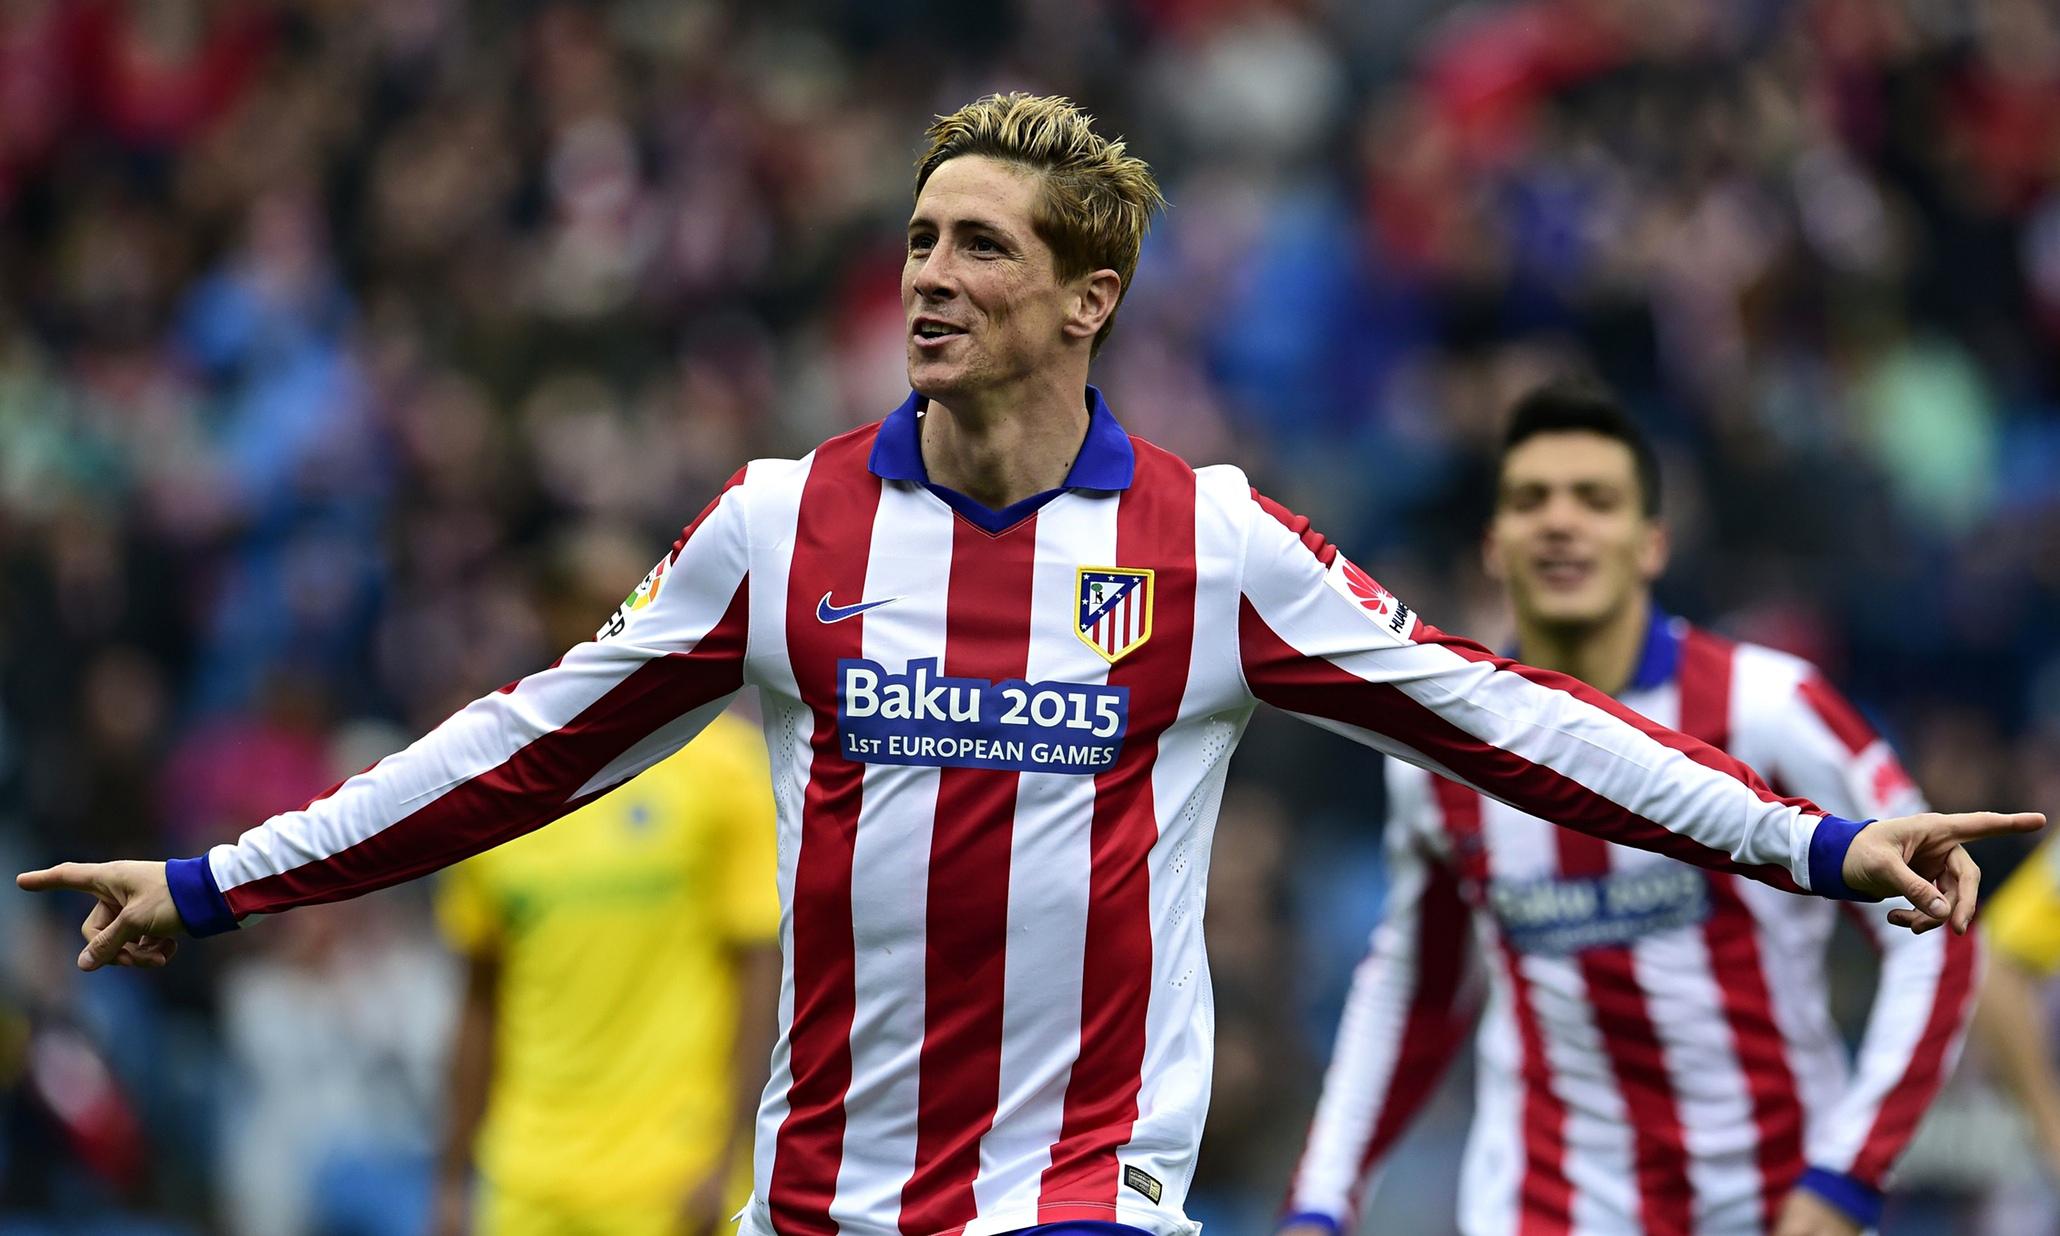 Atletico Madrid 2-0 Getafe